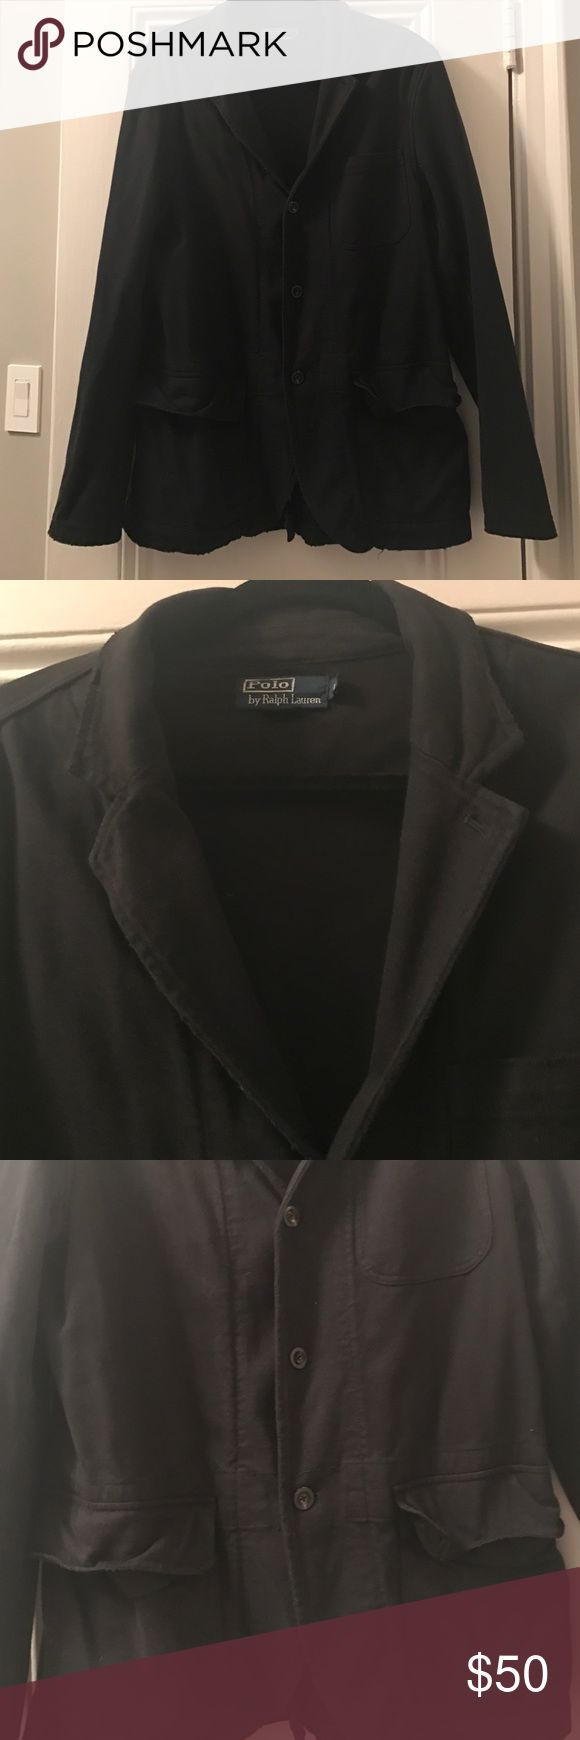 Polo Ralph Lauren black distressed cotton blazer Polo Ralph Lauren black distressed cotton blazer. 3 pockets. Single vent Polo by Ralph Lauren Suits & Blazers Sport Coats & Blazers